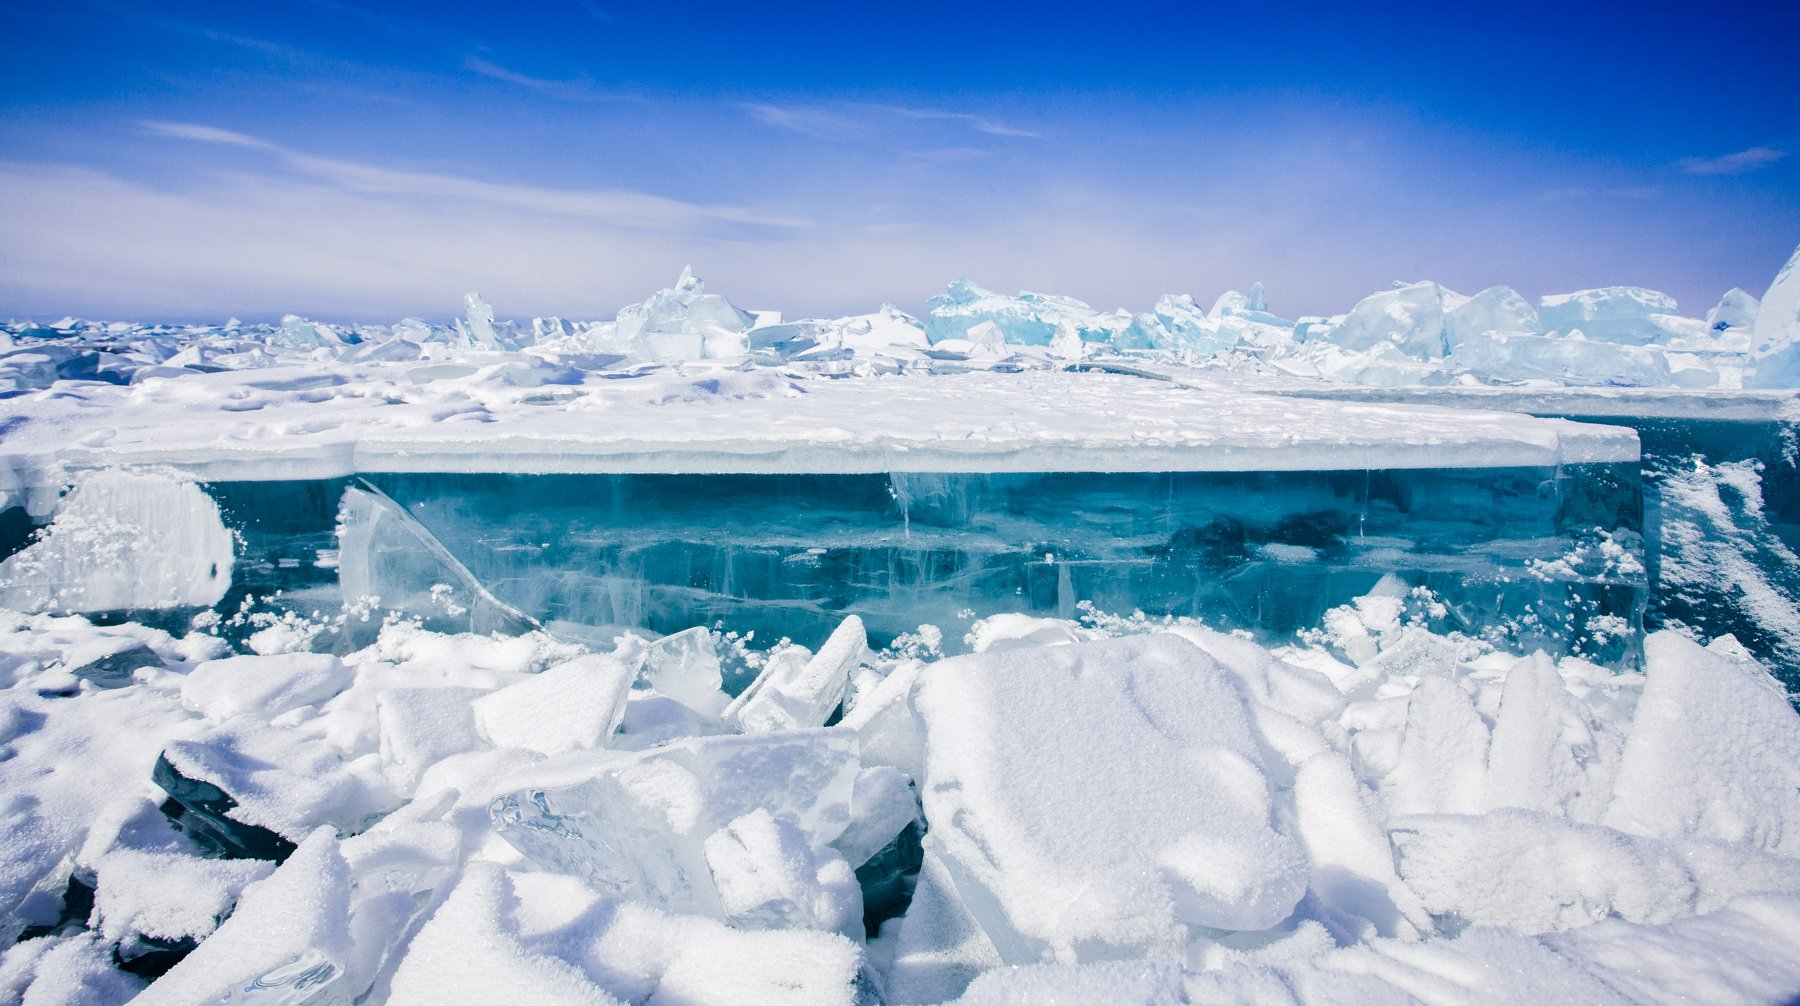 лед, Байкал, зима, озеро, Ольхон, Иван Куликов